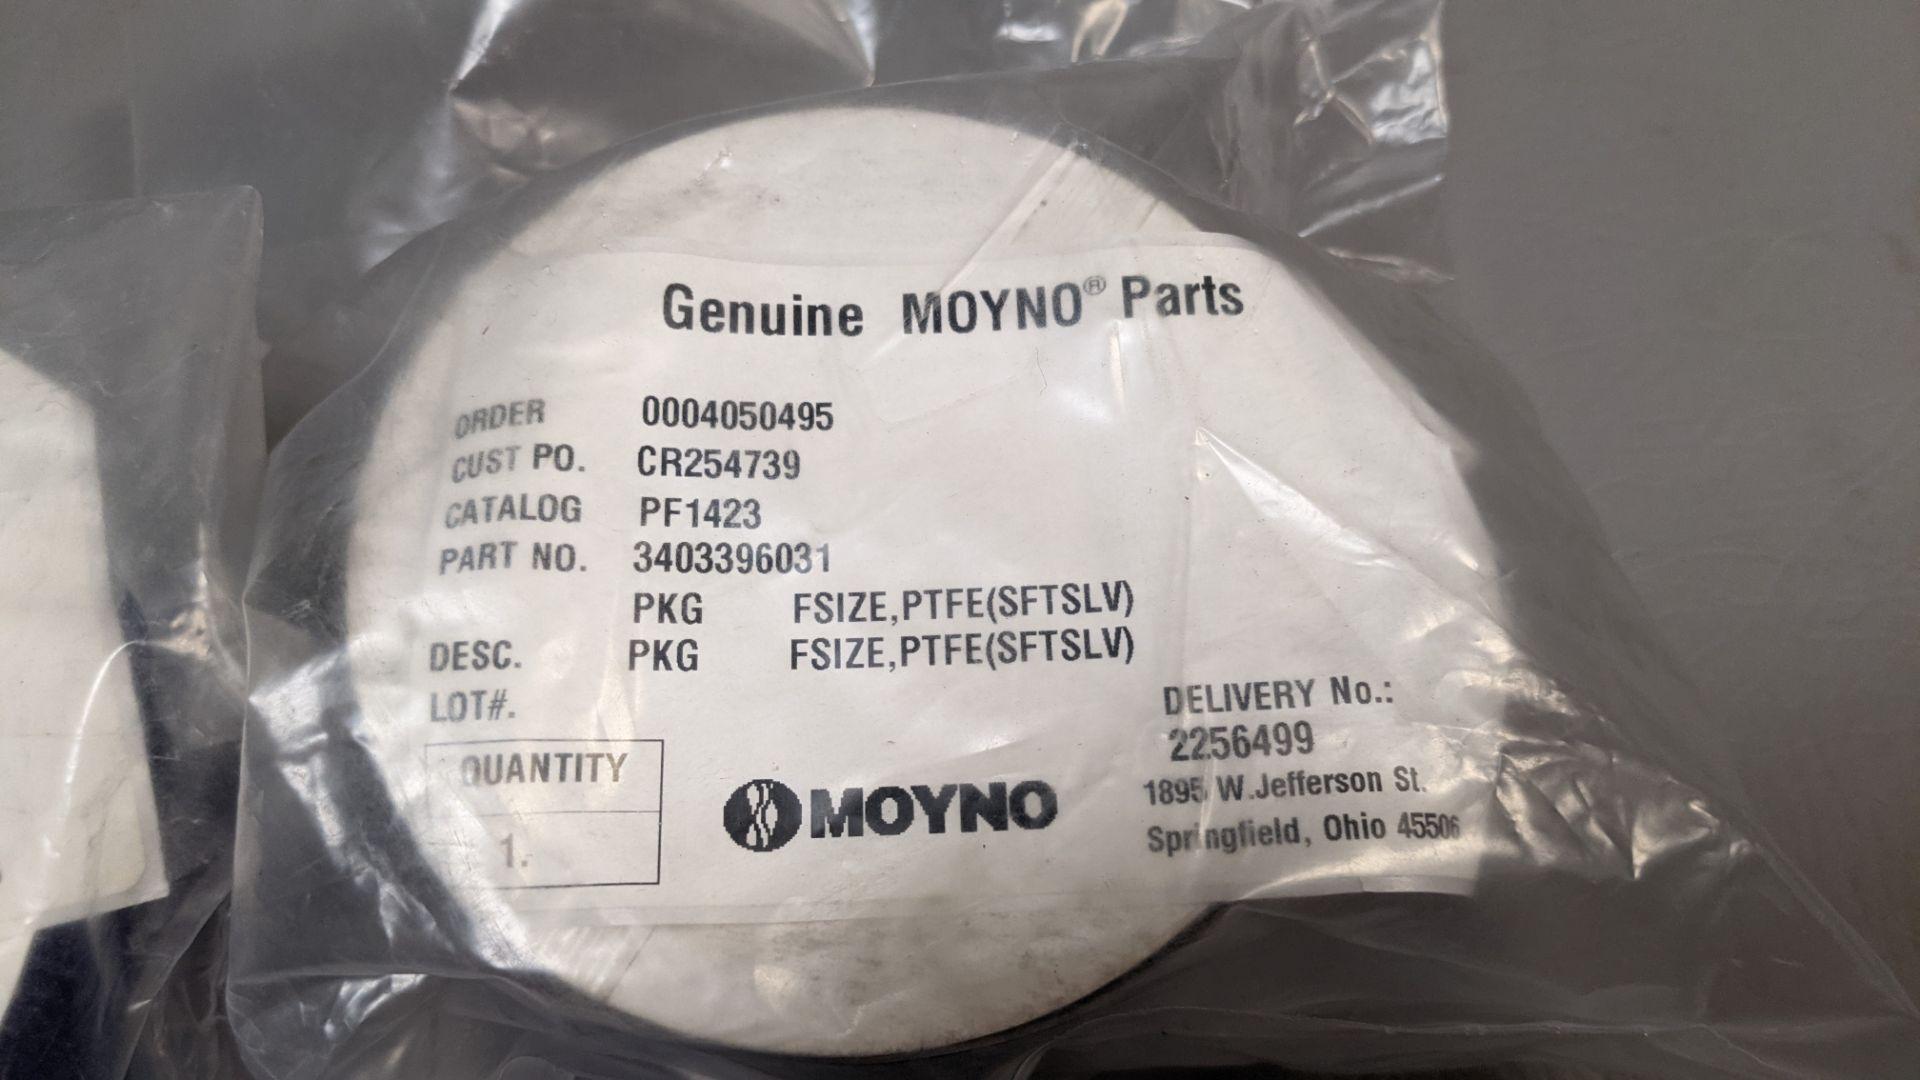 LOT OF 2 NEW MOYNO PUMP PARTS - Image 2 of 3